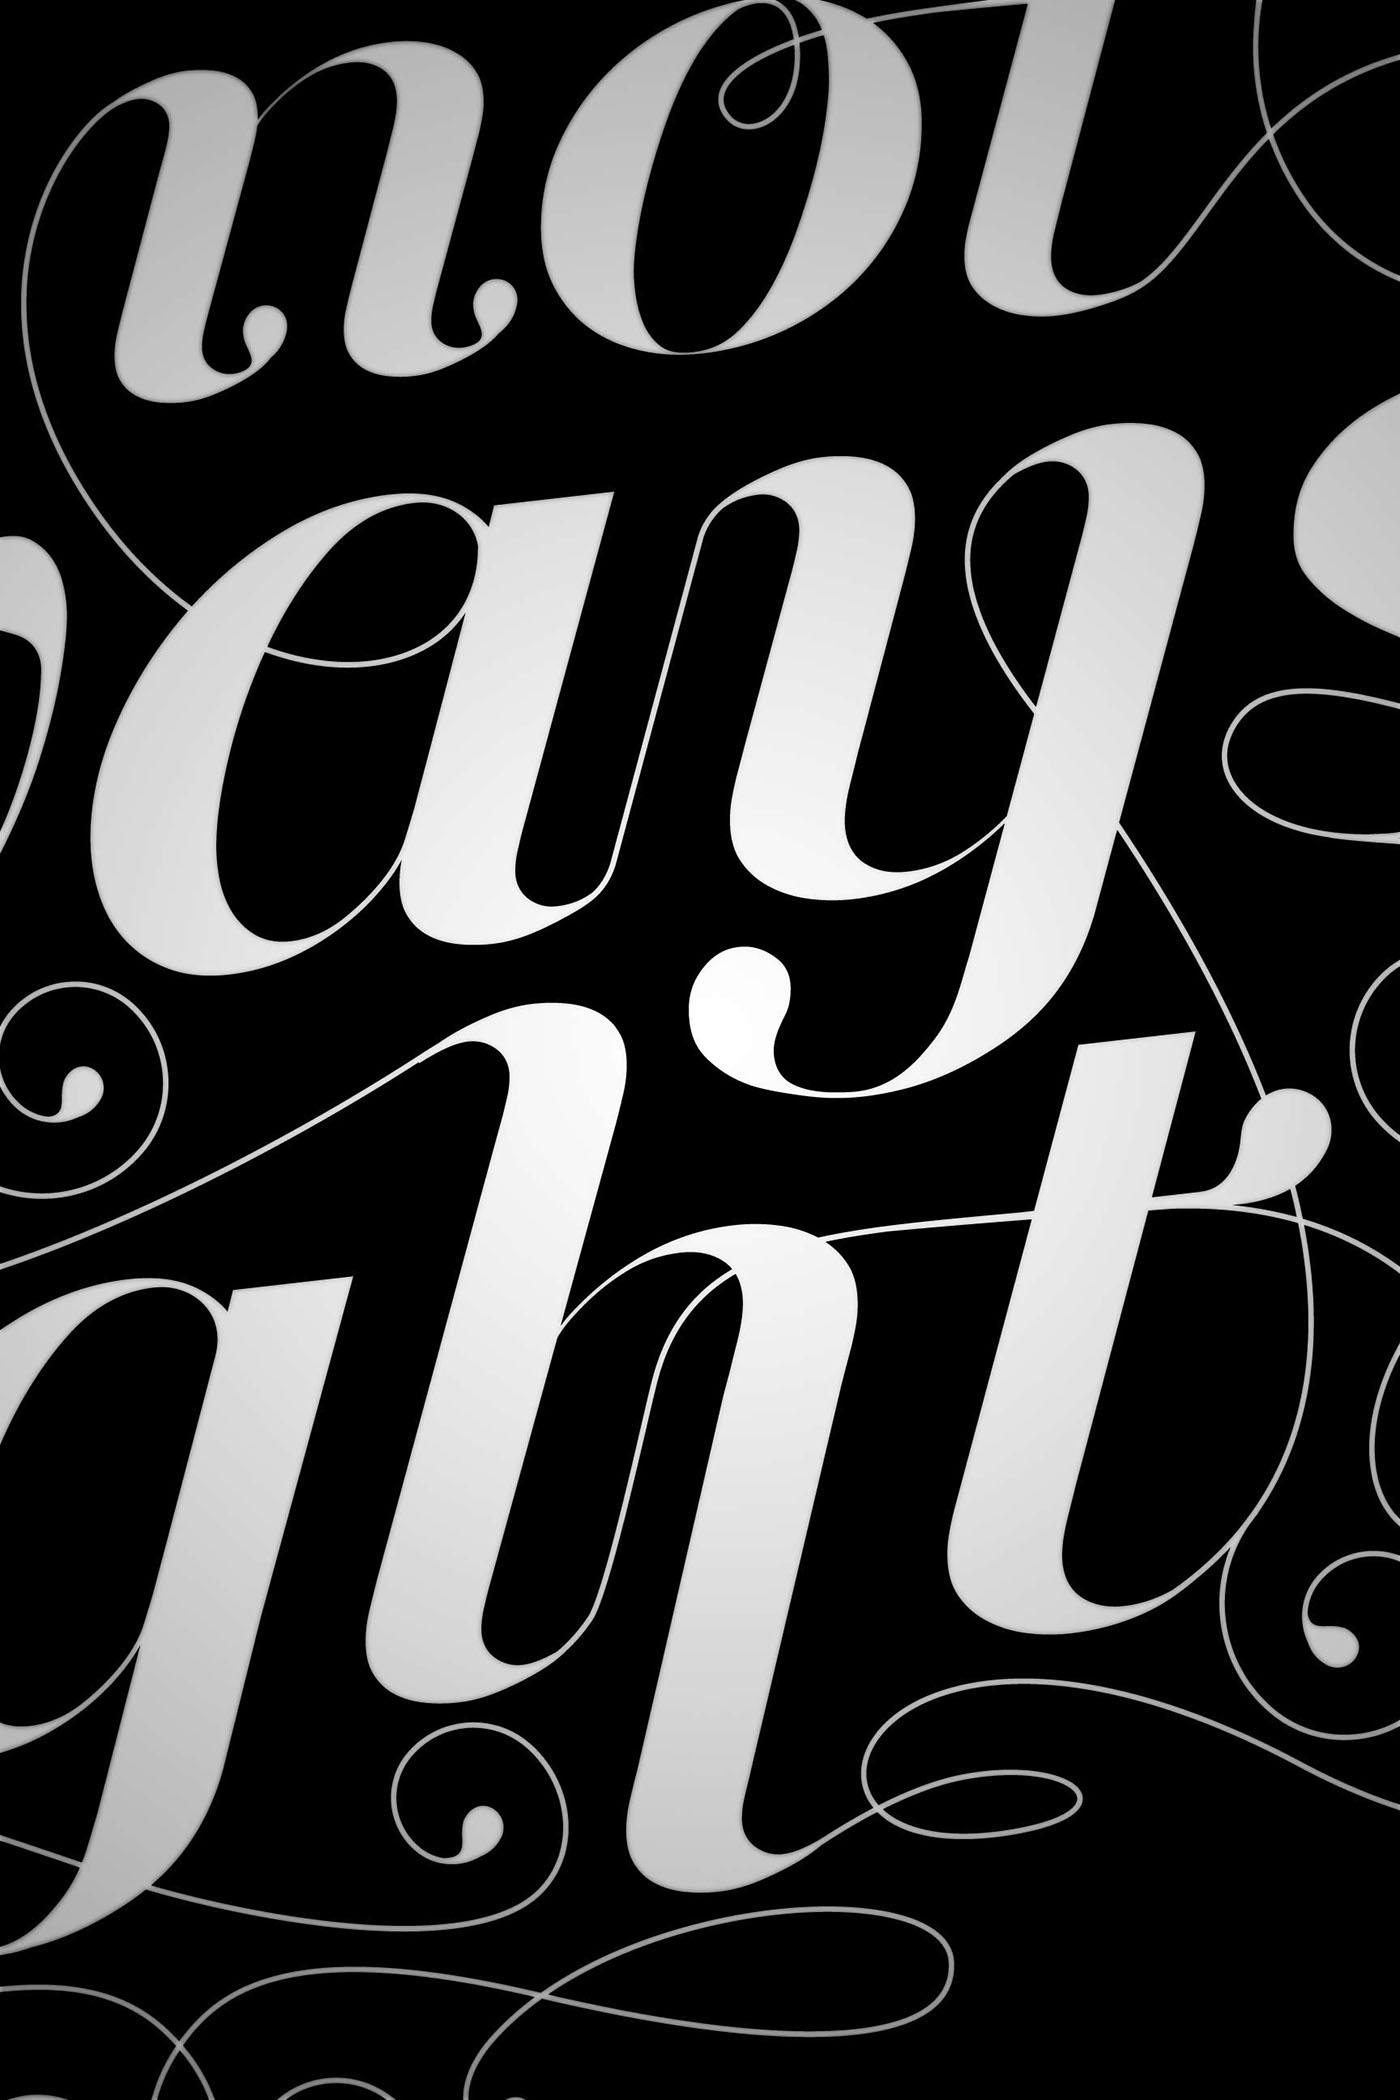 Typographie Script font fonte poster Montreal alphabet letters numbers chiffres lettres black White noir blanc